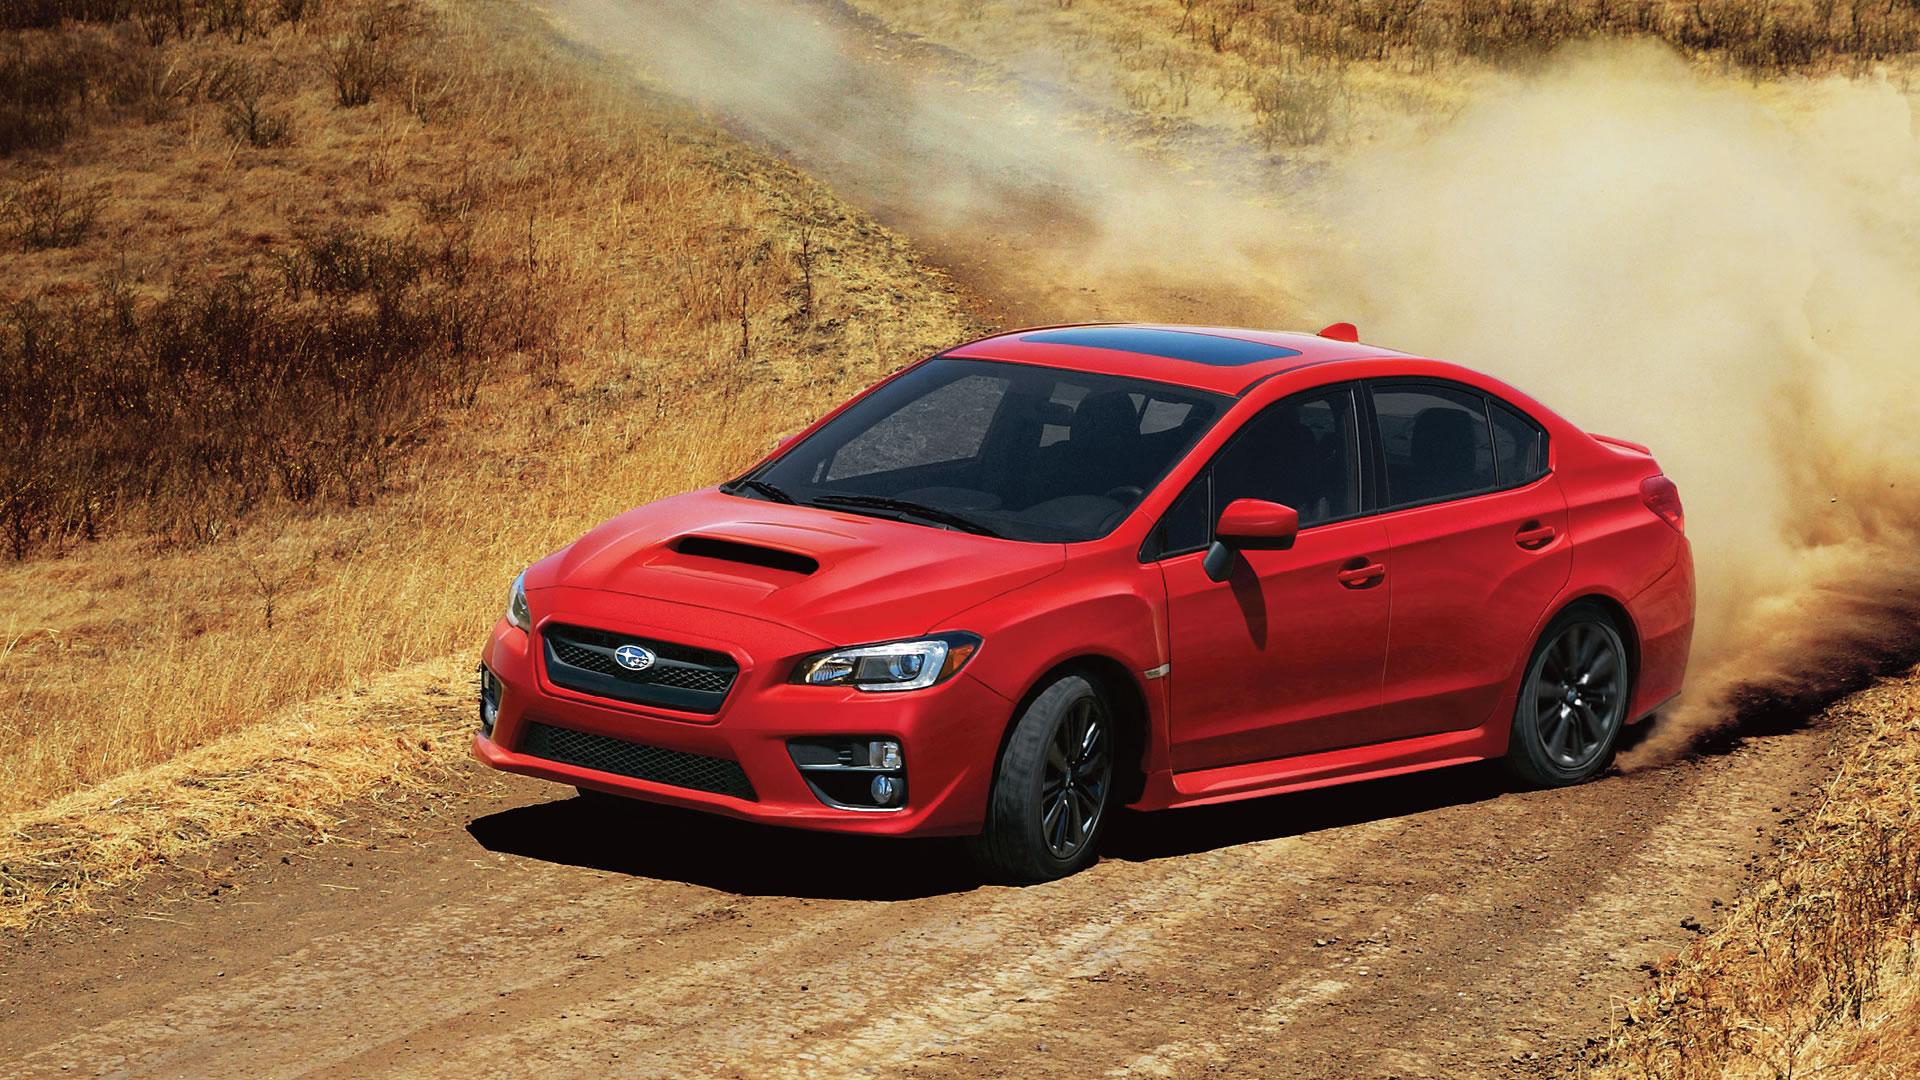 2015 Subaru Impreza Wrx Facts